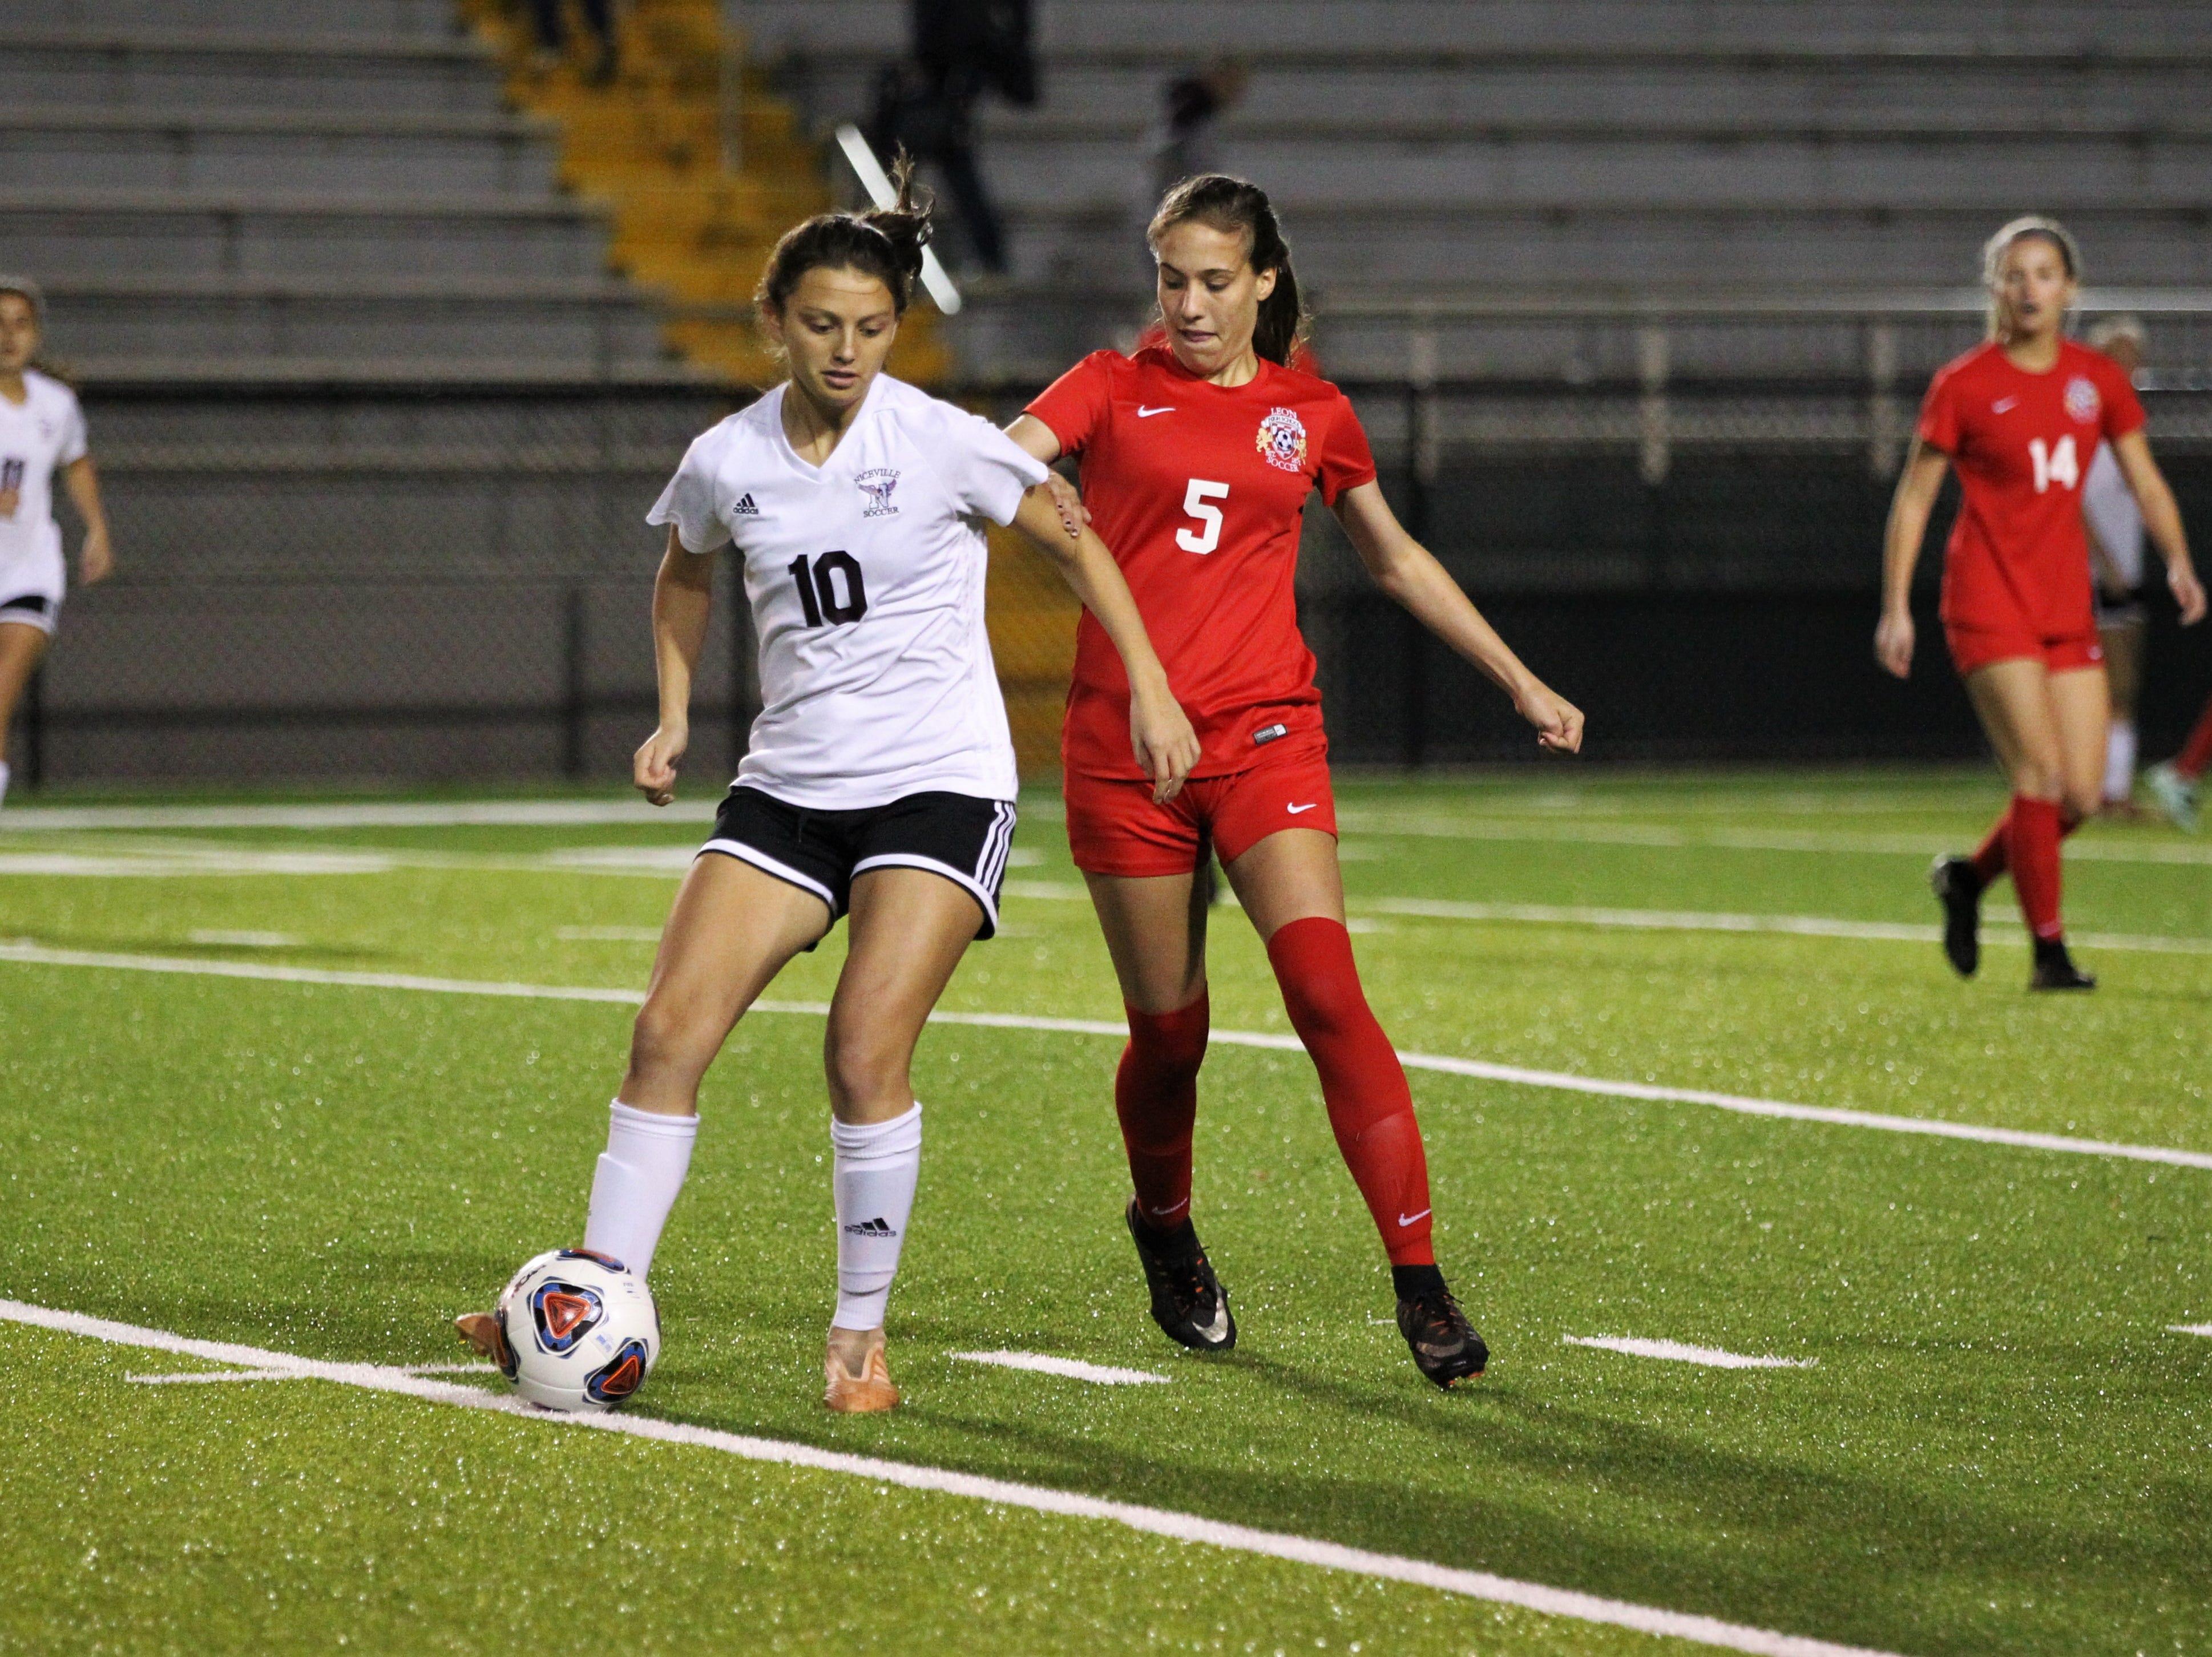 Leon's Allie Krikorian guards Niceville's Ashlyn Fernandez as Niceville's girls soccer team beat Leon 1-0 in a Region 1-4A semifinal at Gene Cox Stadium on Jan. 8, 2019.